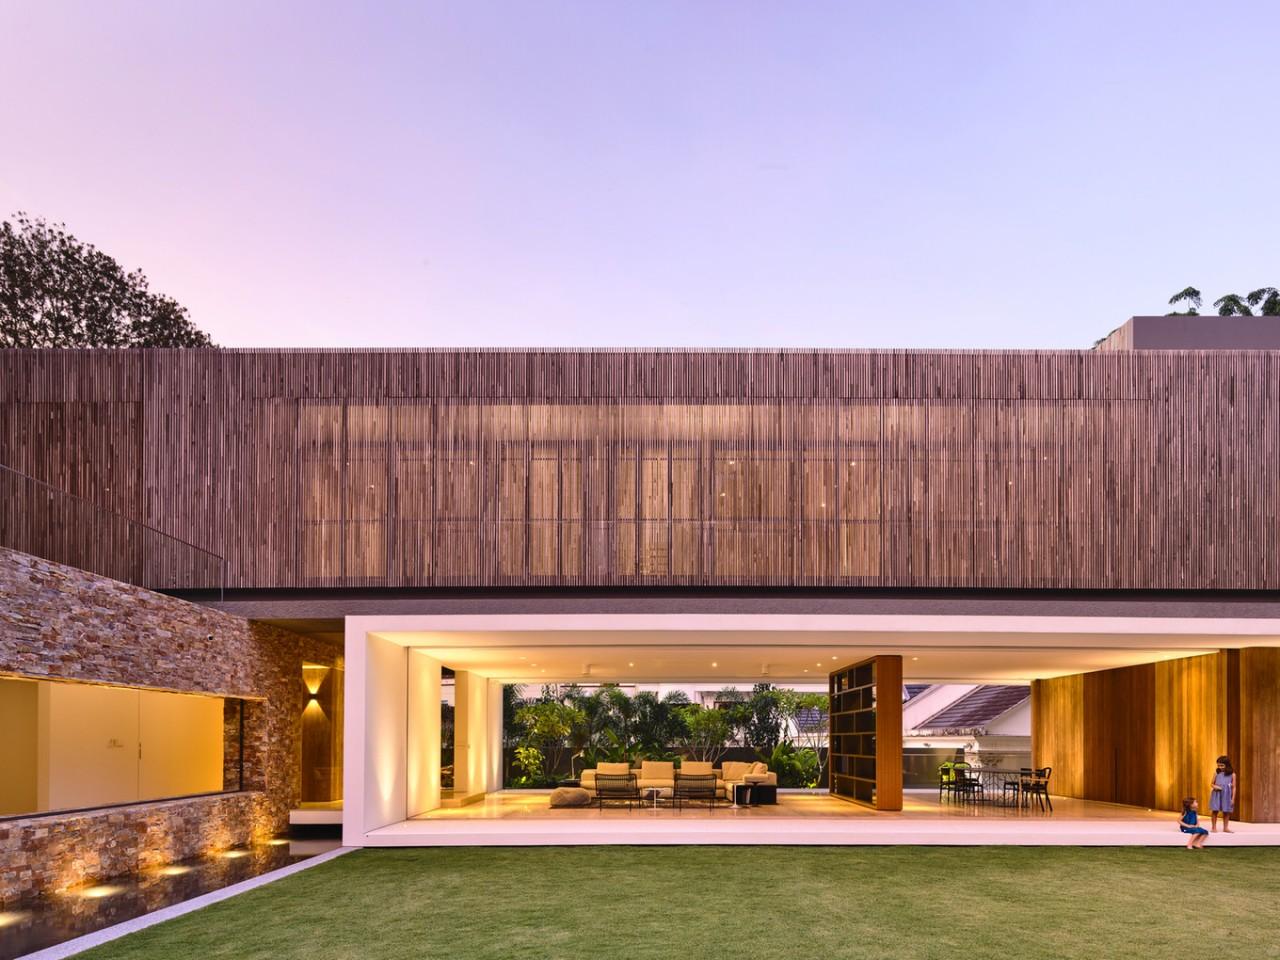 Дом в Сингапуре: диалог с окружающим ландшафтом